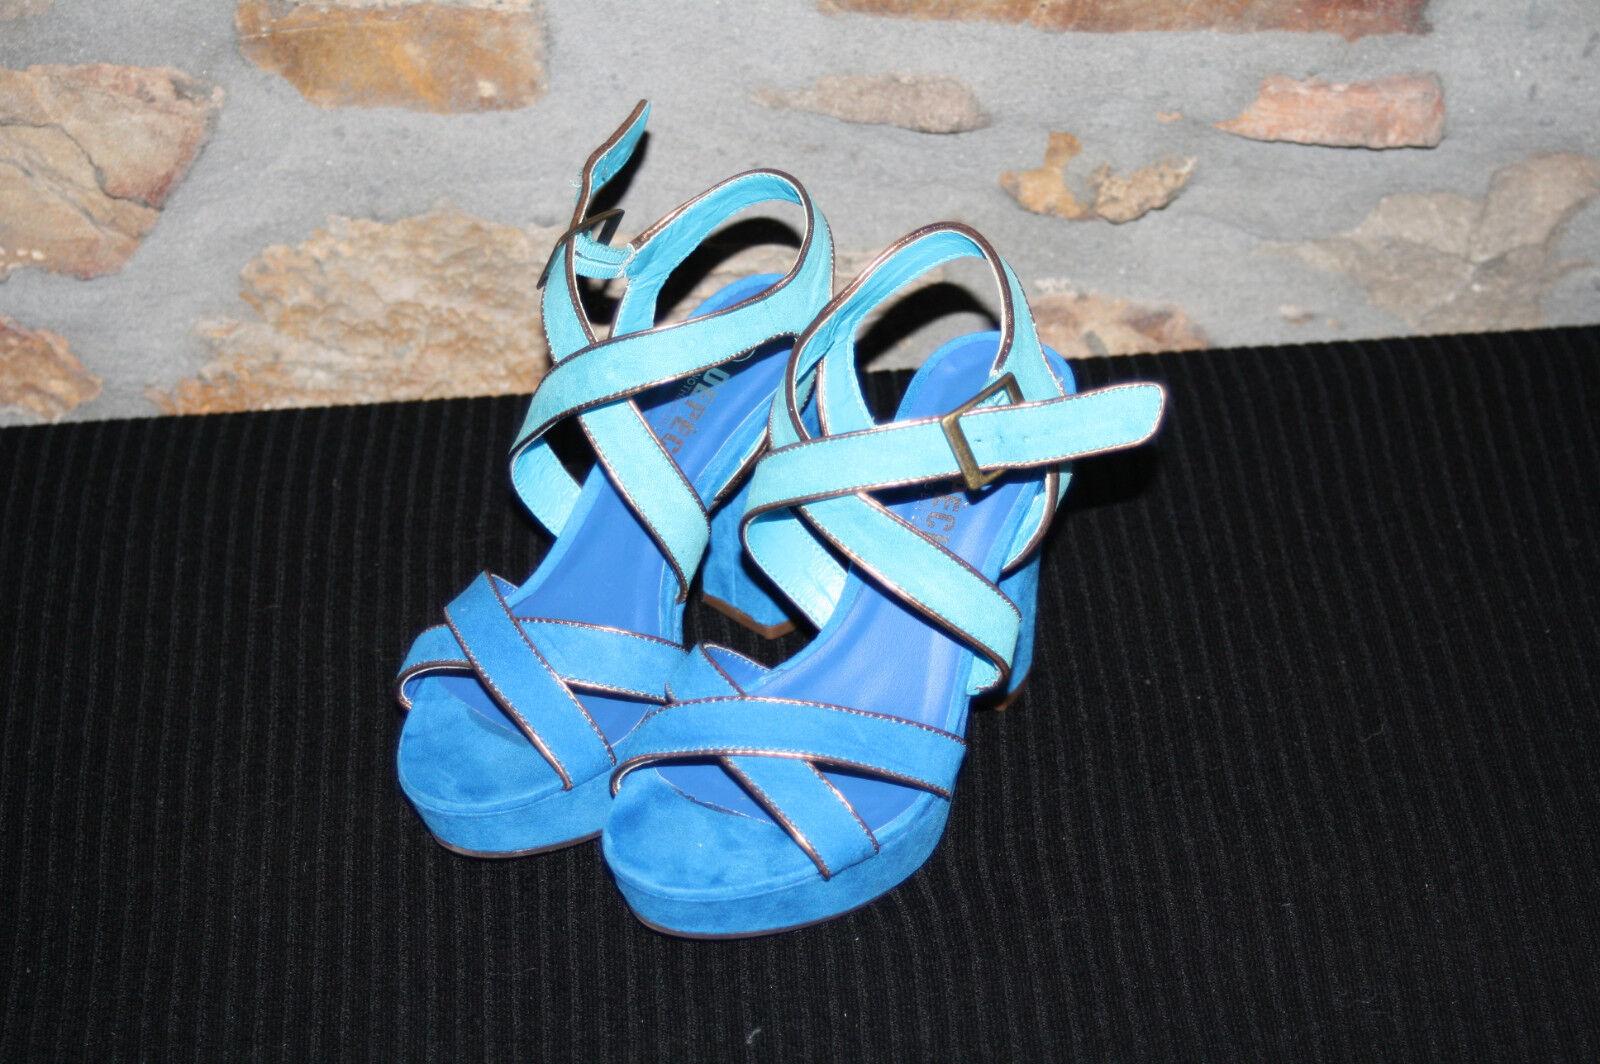 türkis - blau - gold @ Pumps @ Block Highheels @ Samba @ Plateau @ Karneval @ 36